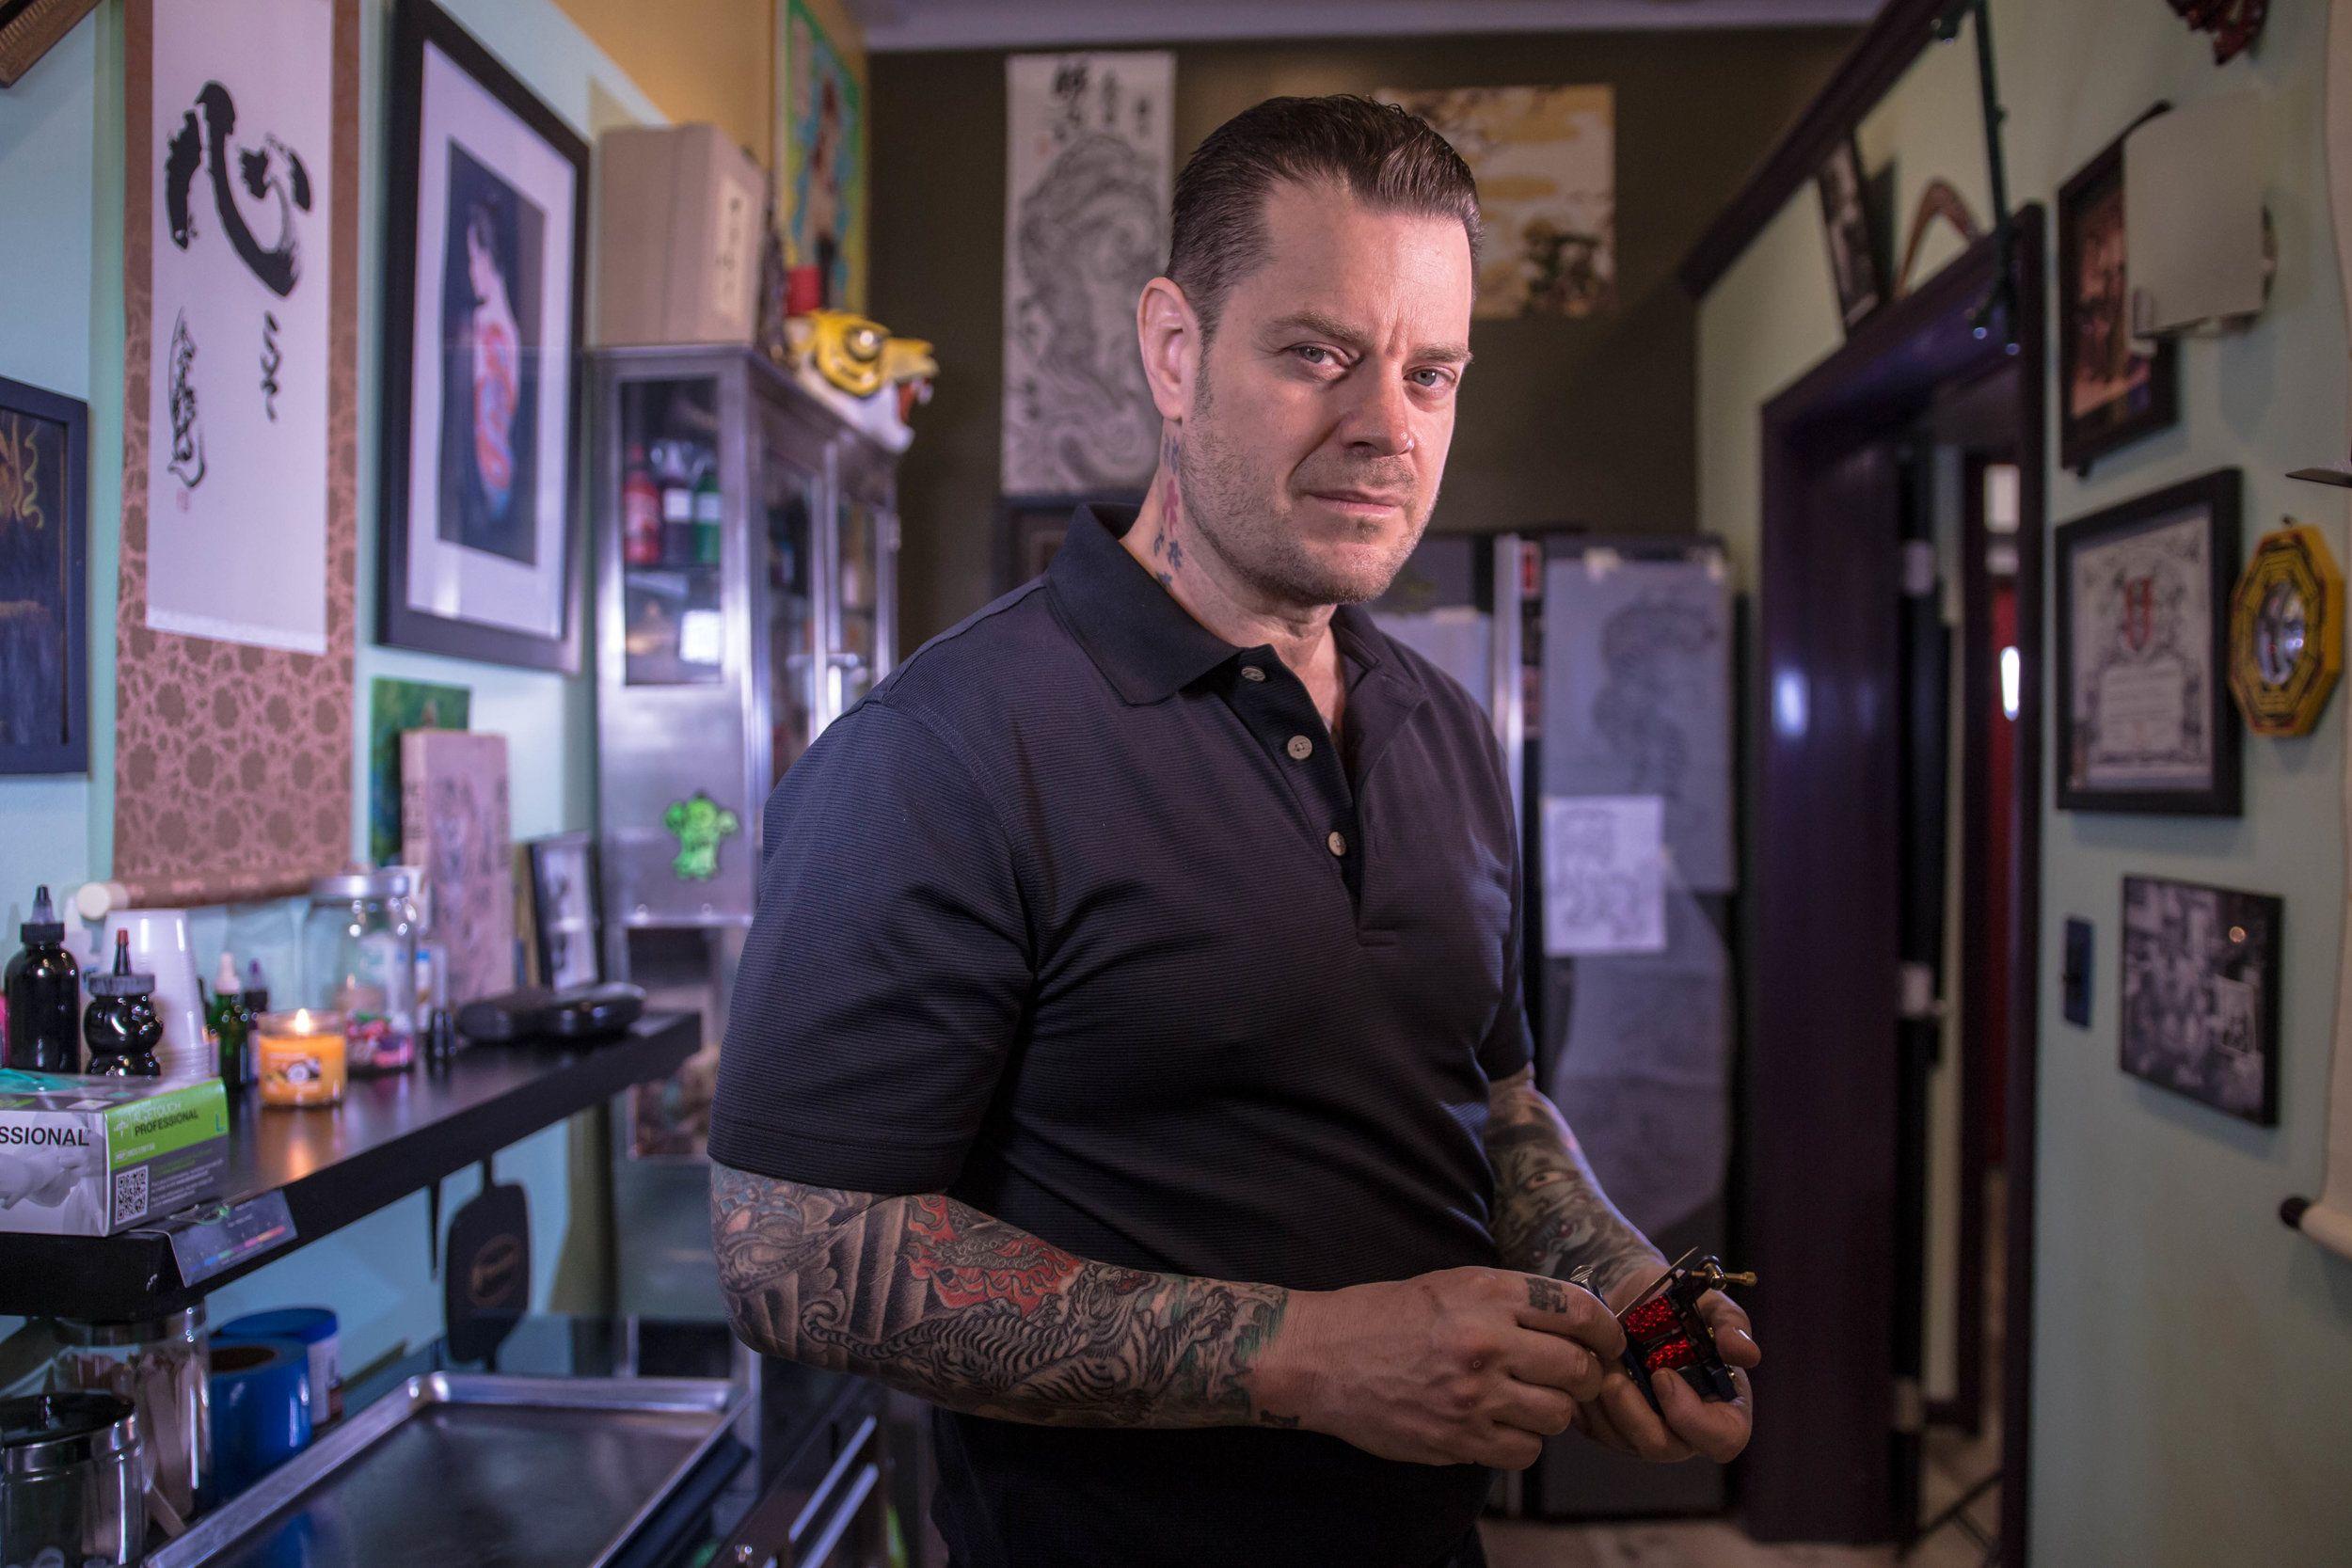 JOE VEGAS Vegas tattoo, Thunderbolt tattoo, Las vegas